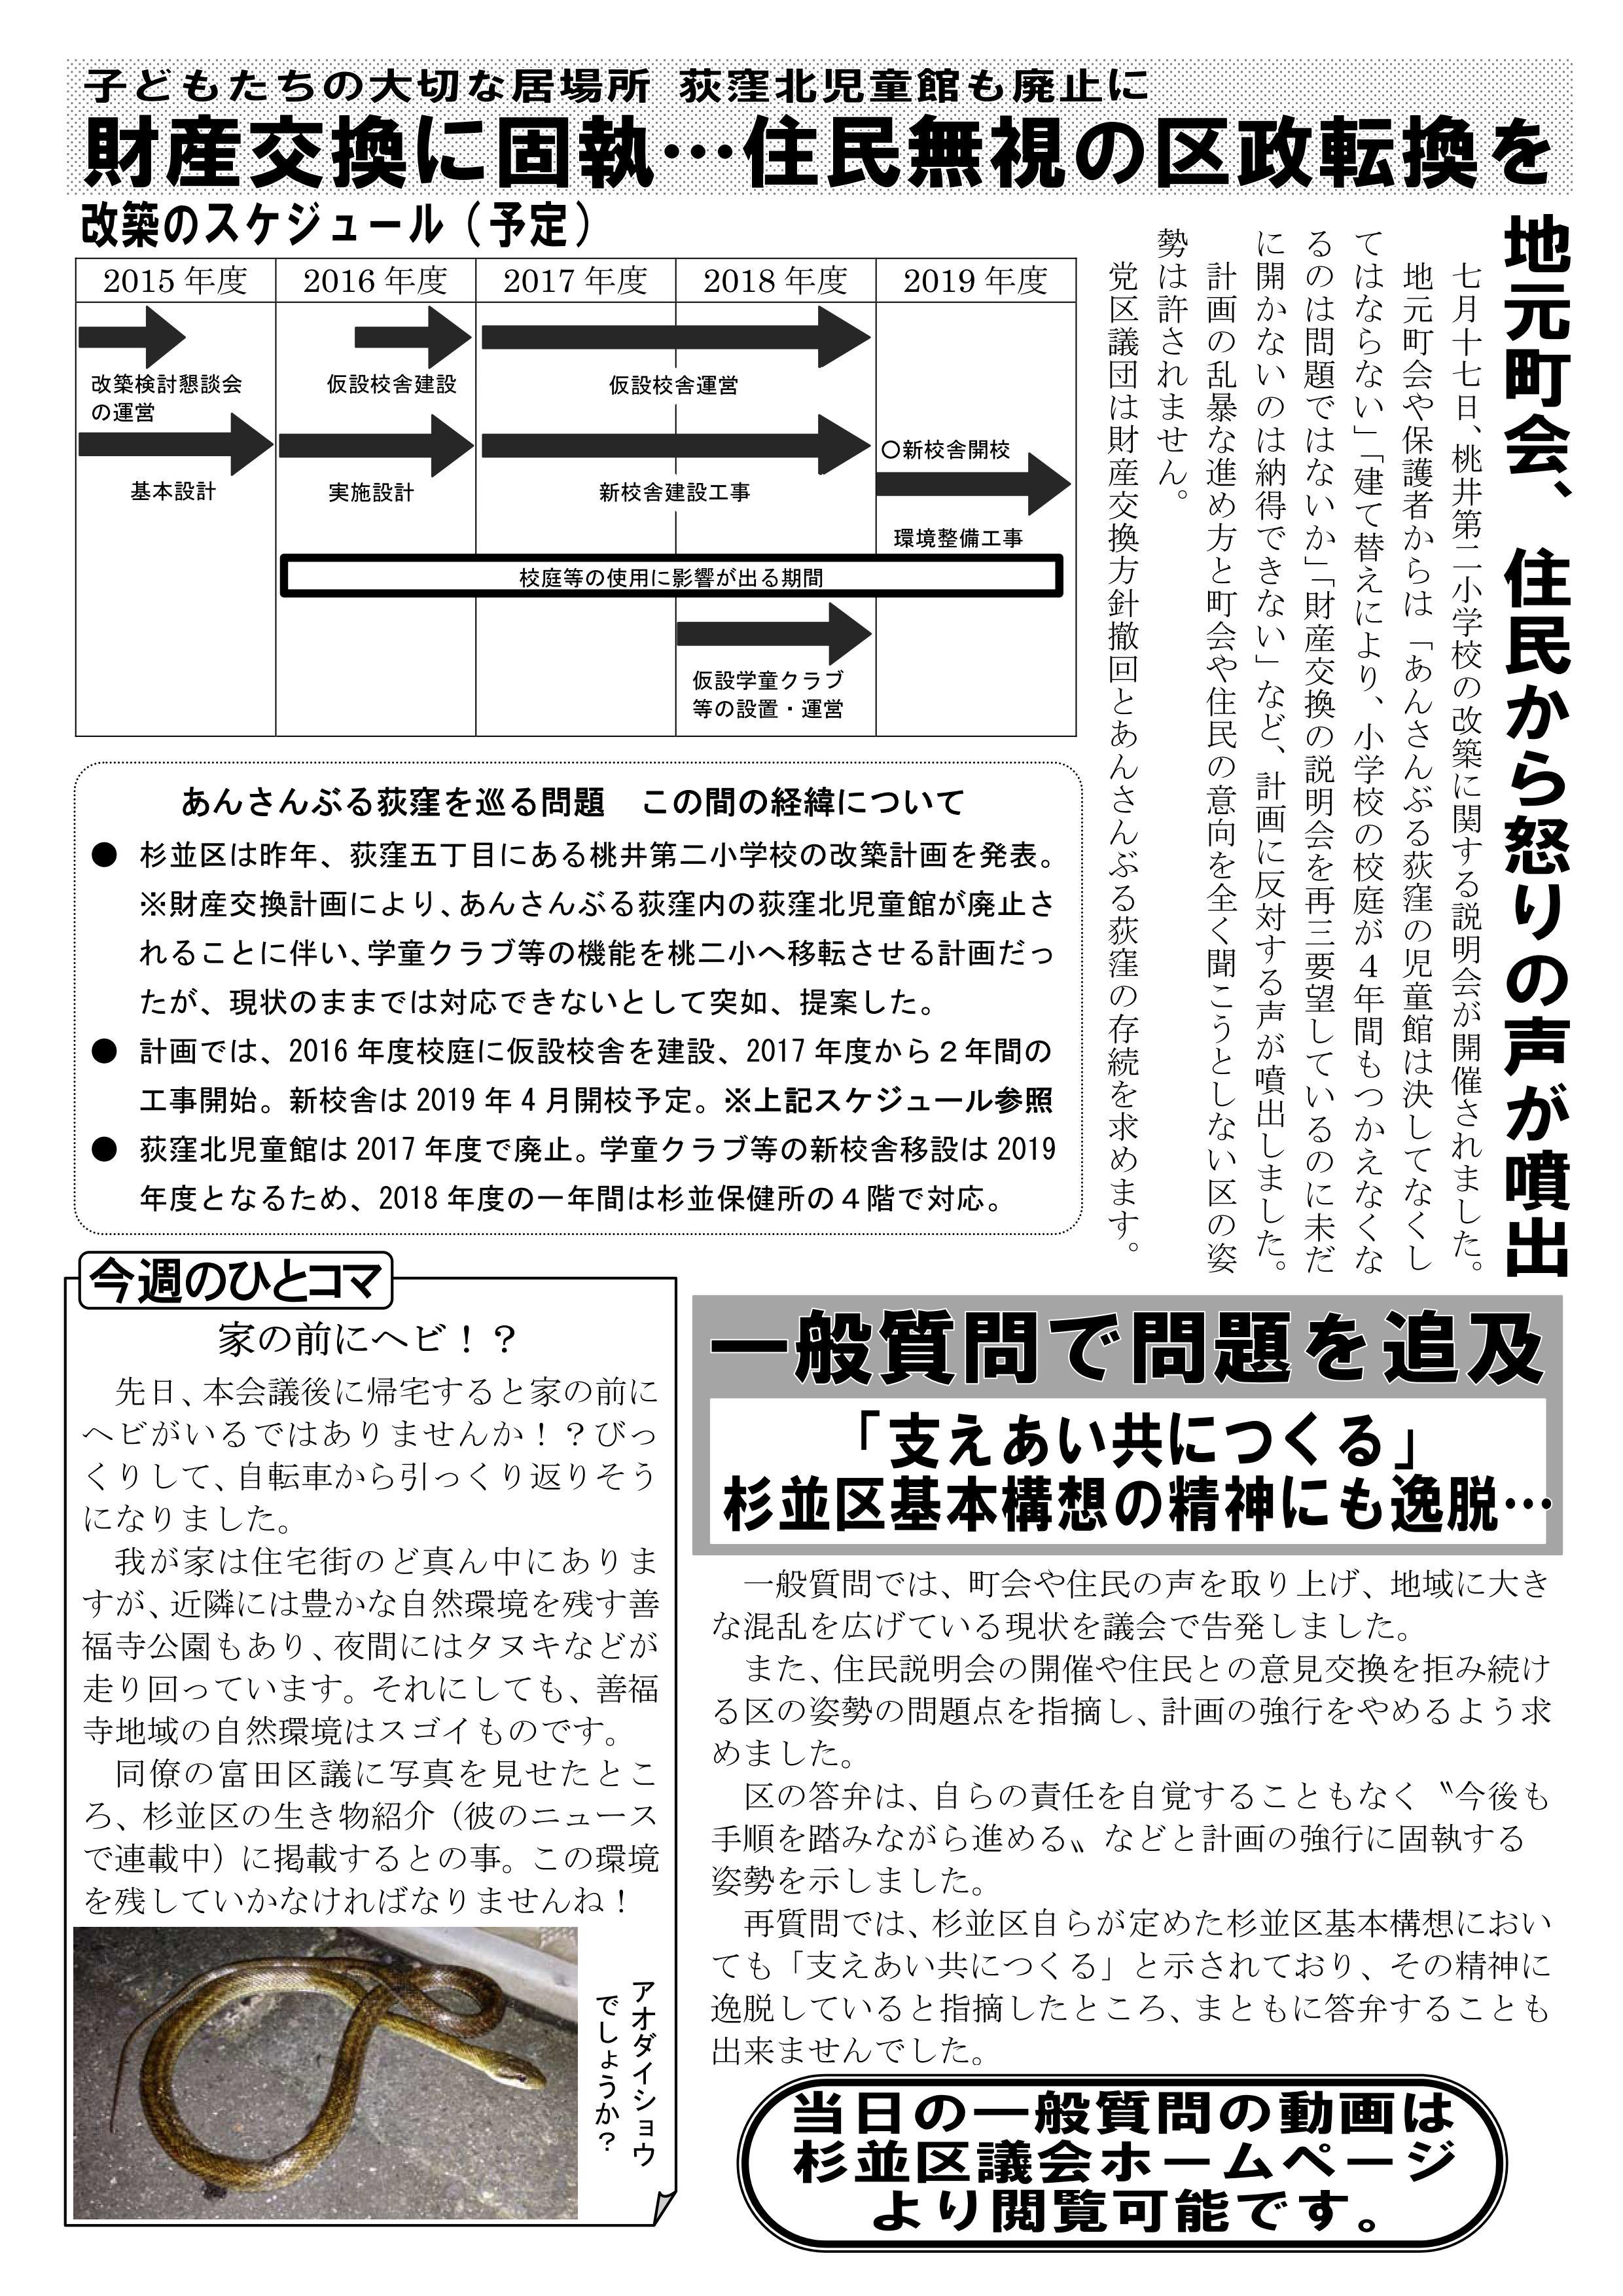 http://yamadakohei.jp/blog_upfile/%E9%80%B1%E5%88%8A%E5%B1%B1%E7%94%B0%E3%83%8B%E3%83%A5%E3%83%BC%E3%82%B9207_02.jpg